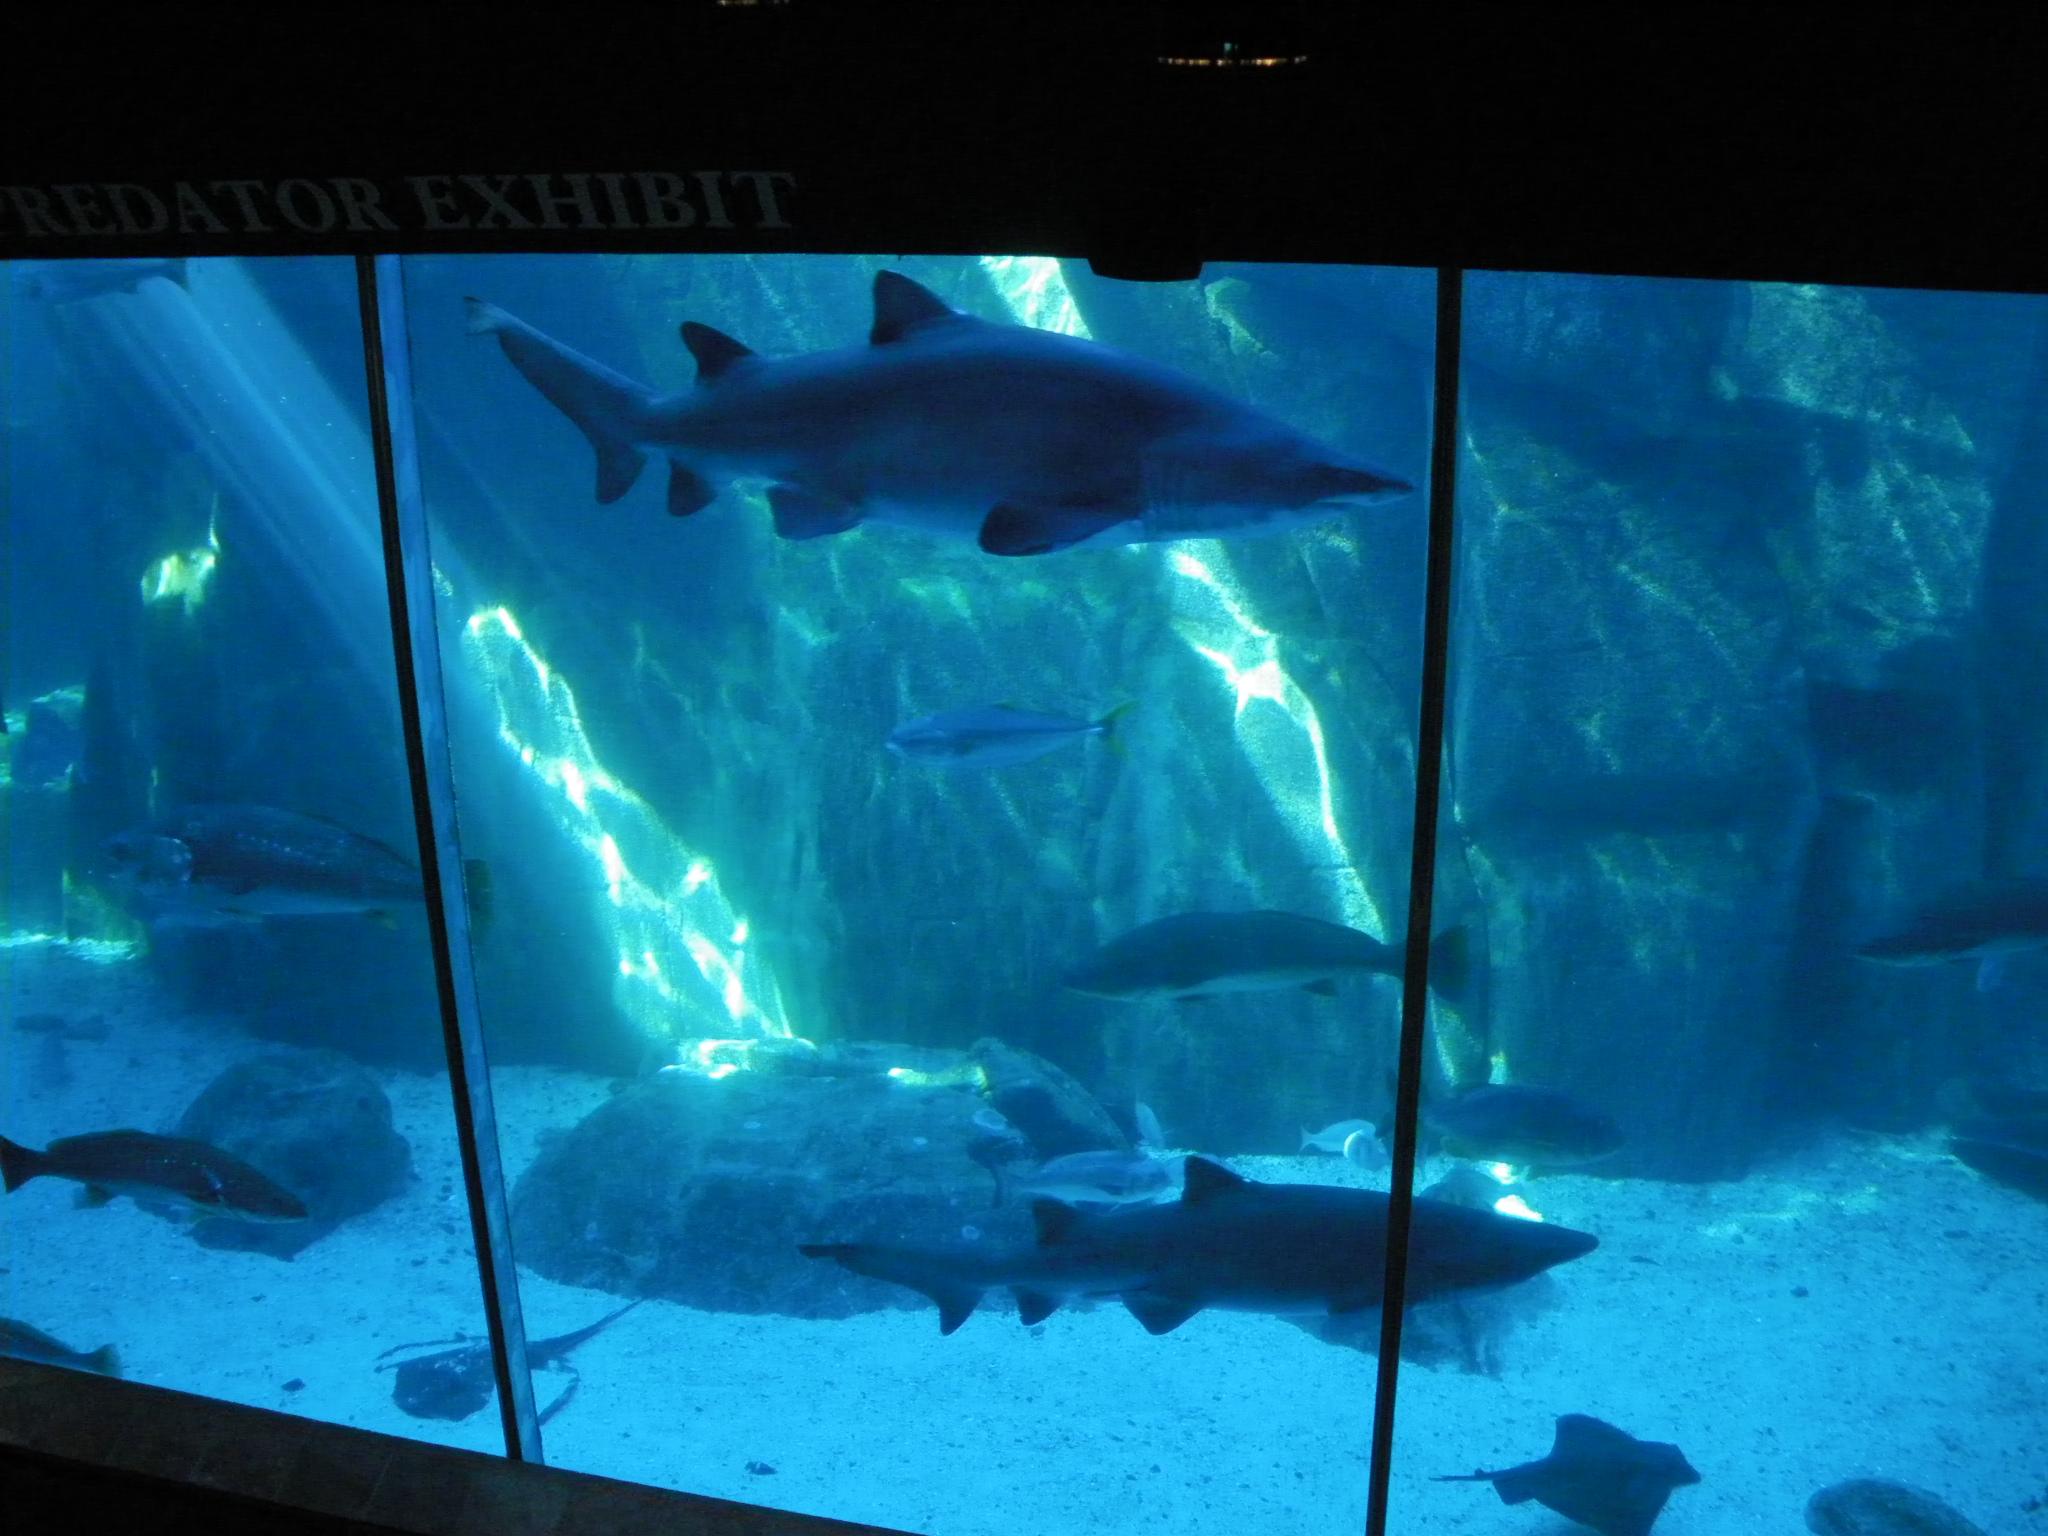 Two Oceans Aquarium Cape Town : File:Two Oceans Aquarium05.jpg - Wikimedia Commons